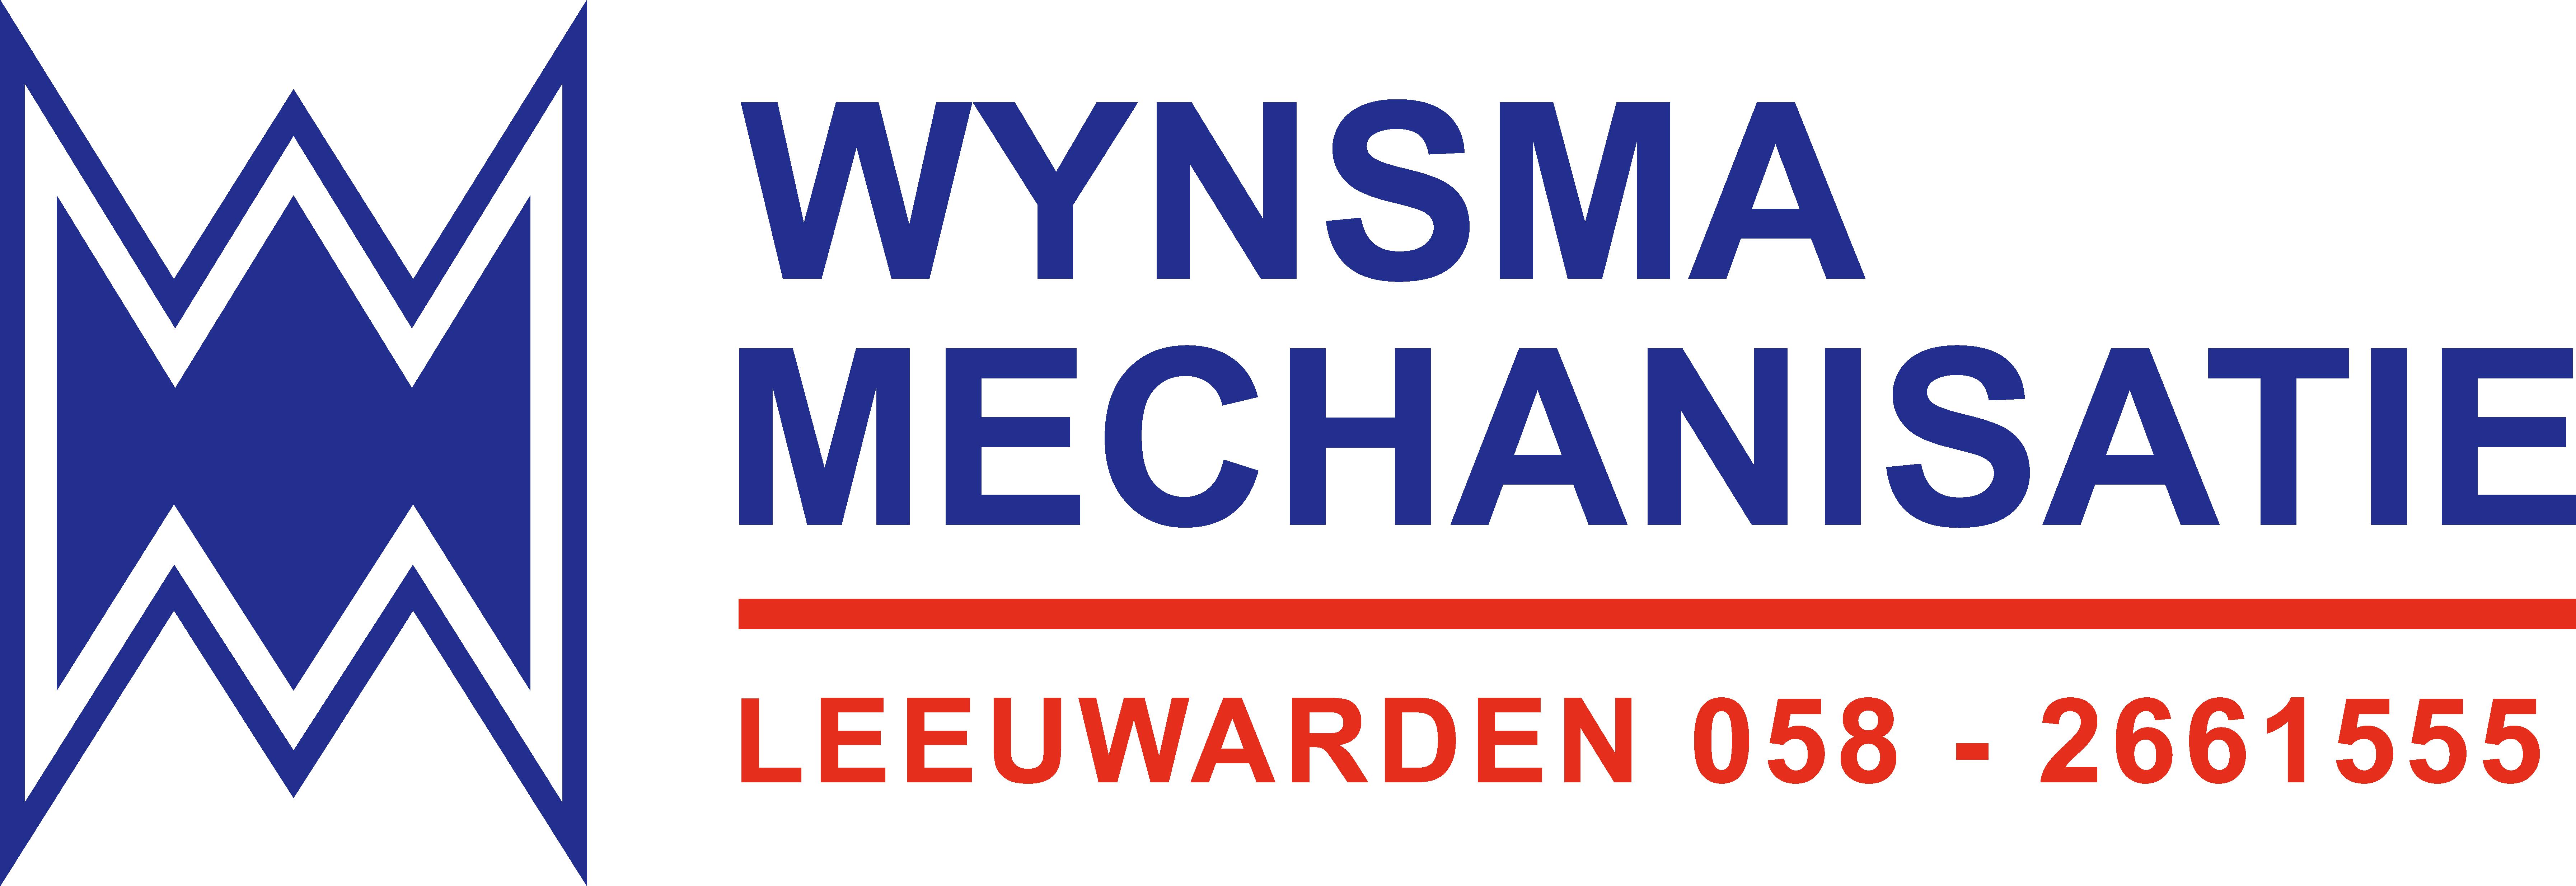 Logo Wynsma